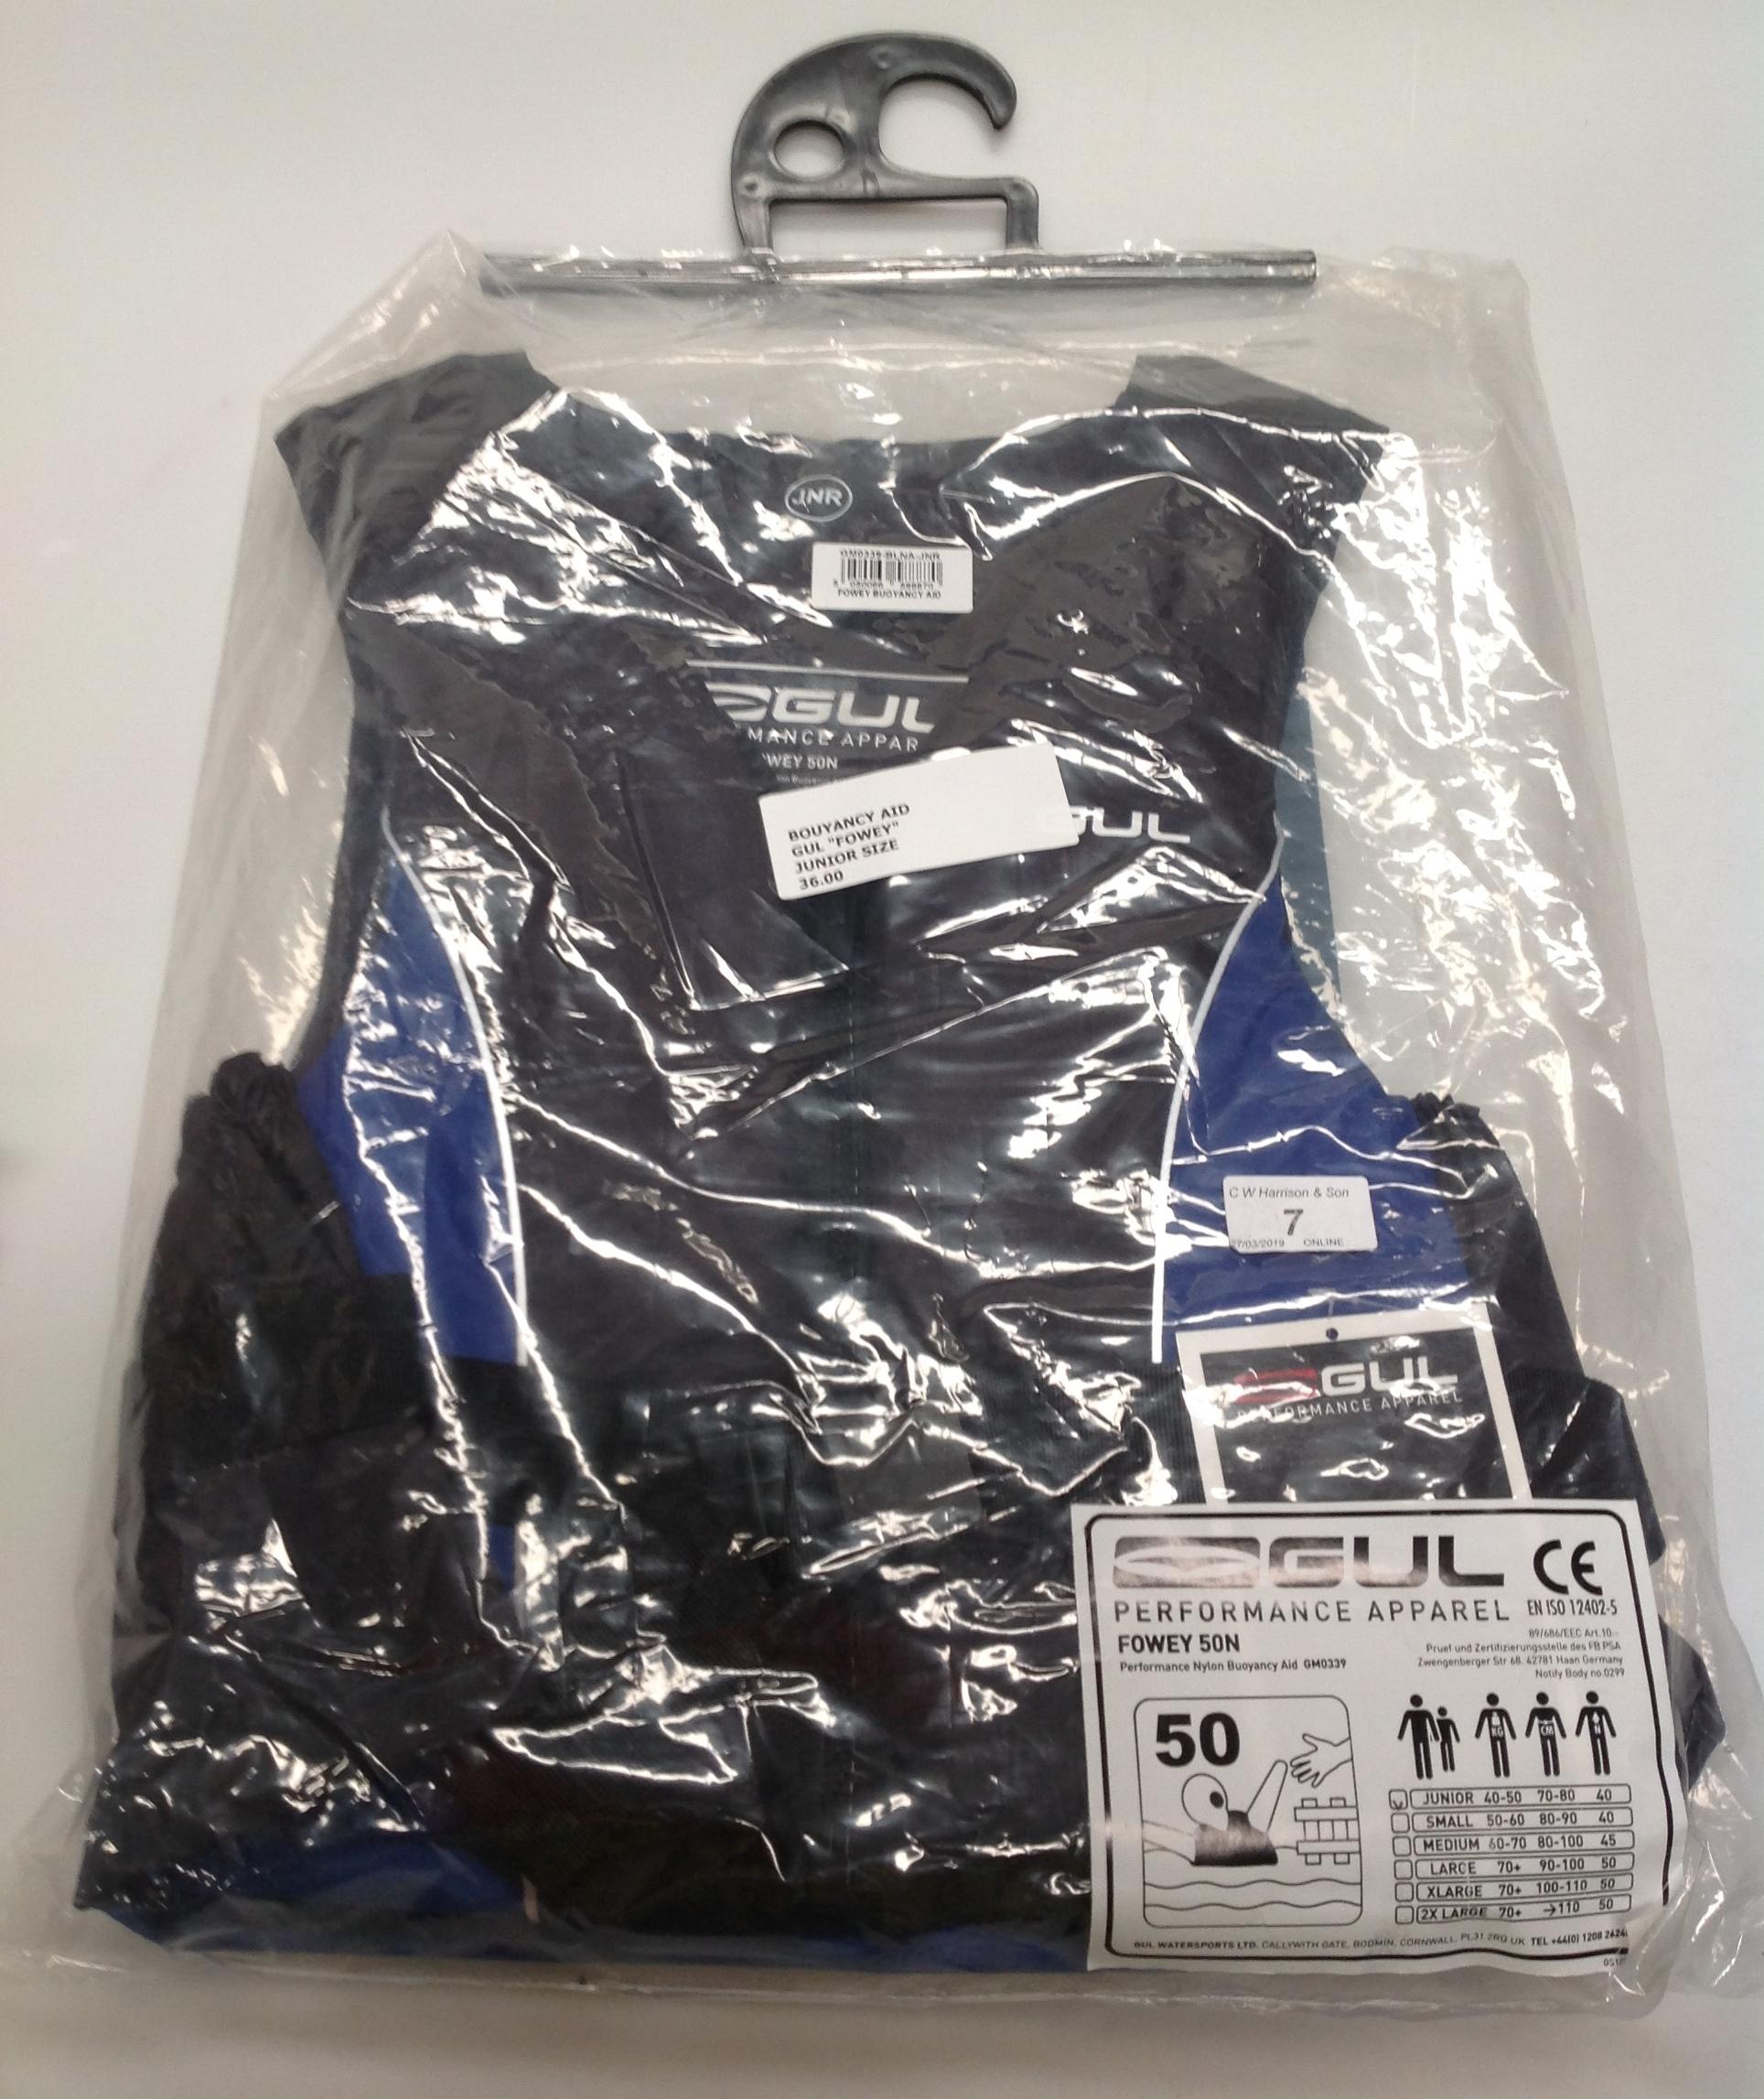 Lot 7 - Gul Fowey 5ON buoyancy aid in blue and black - size junior (RRP £36)